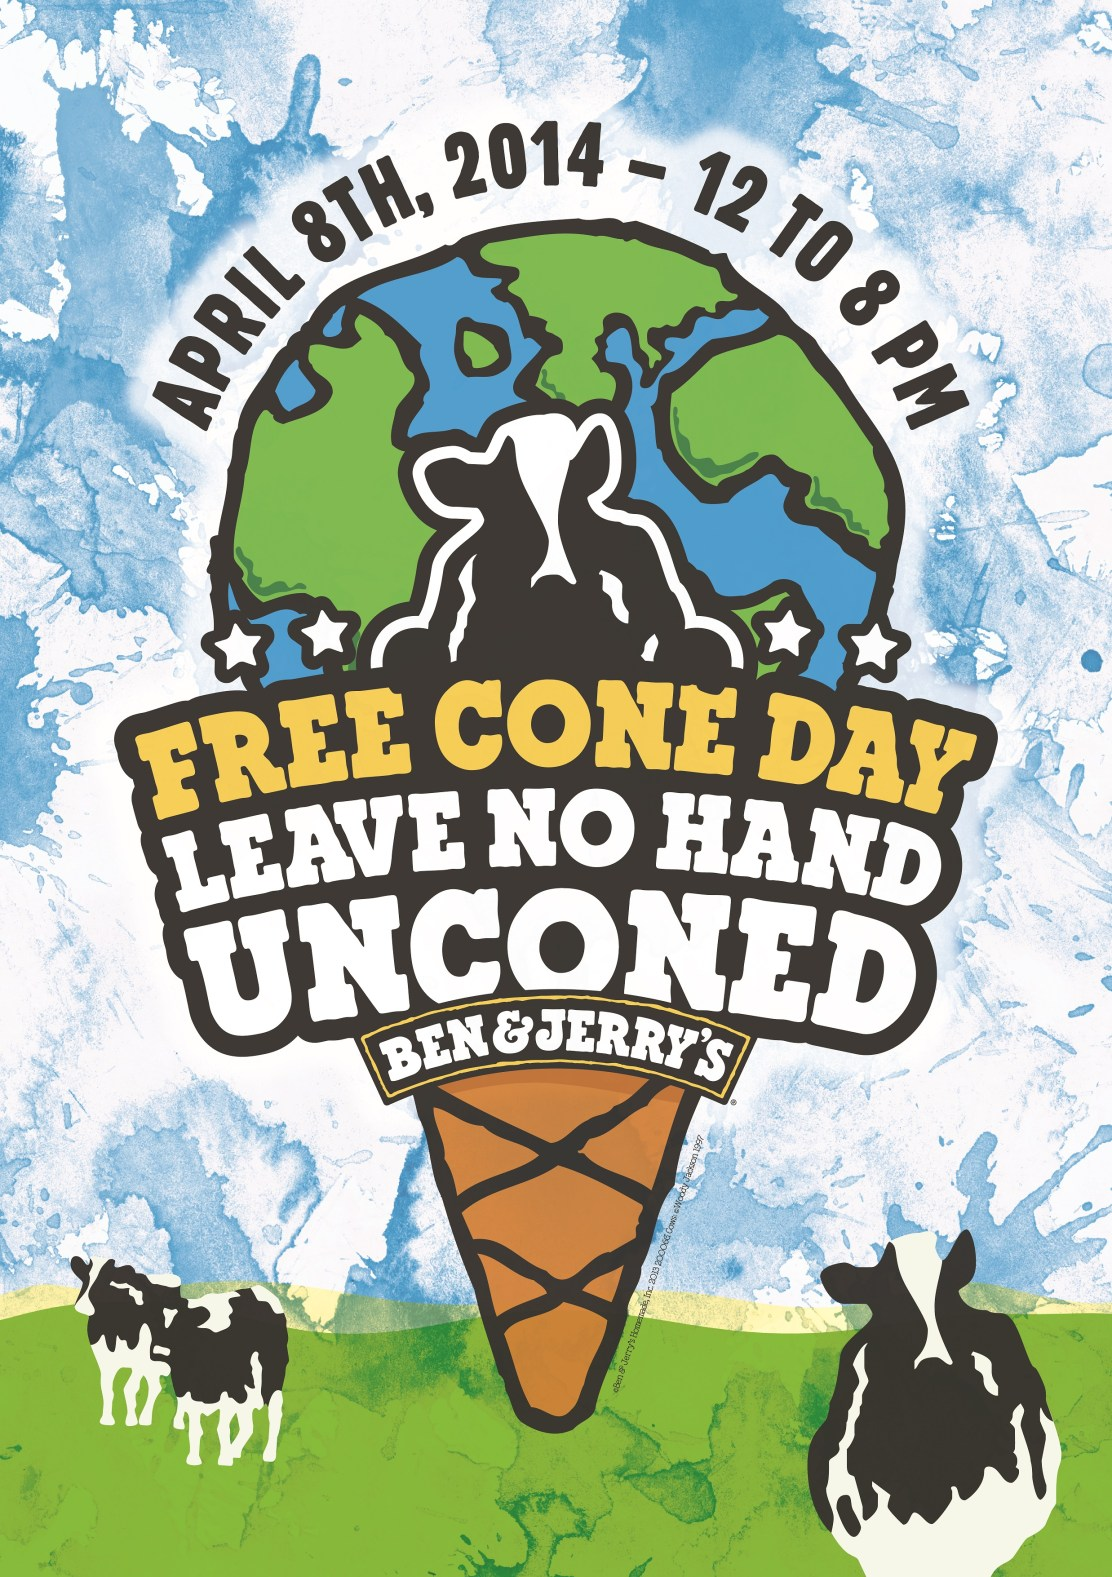 Free Cone Day 2014 key visual